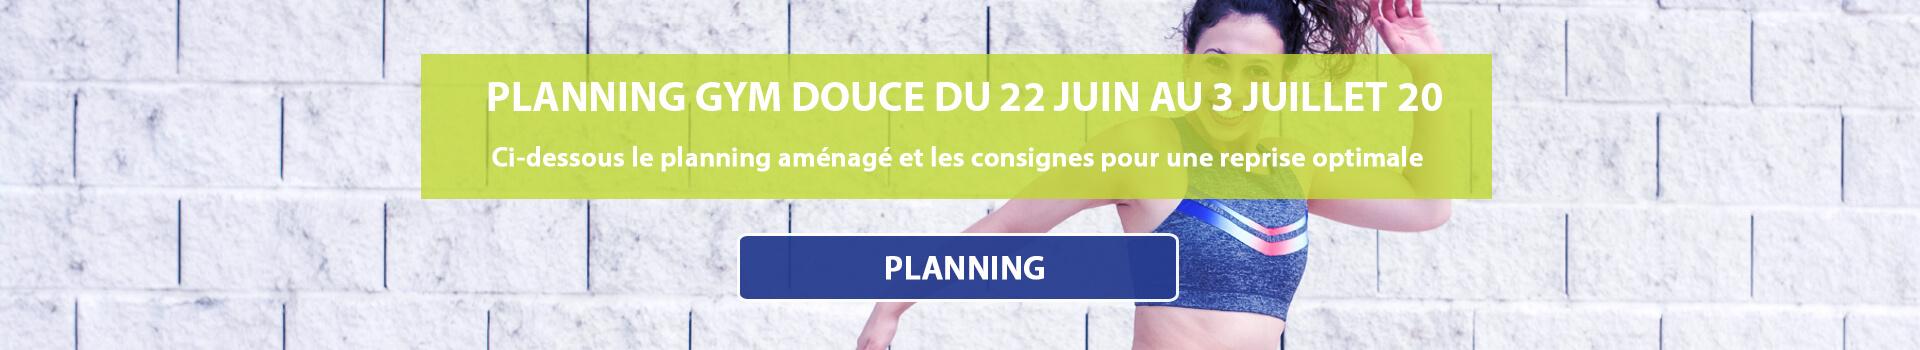 bandeau_PLANNING-GYM-DOUCE_-DU-22-JUIN-AU-3-JULLET_19-20